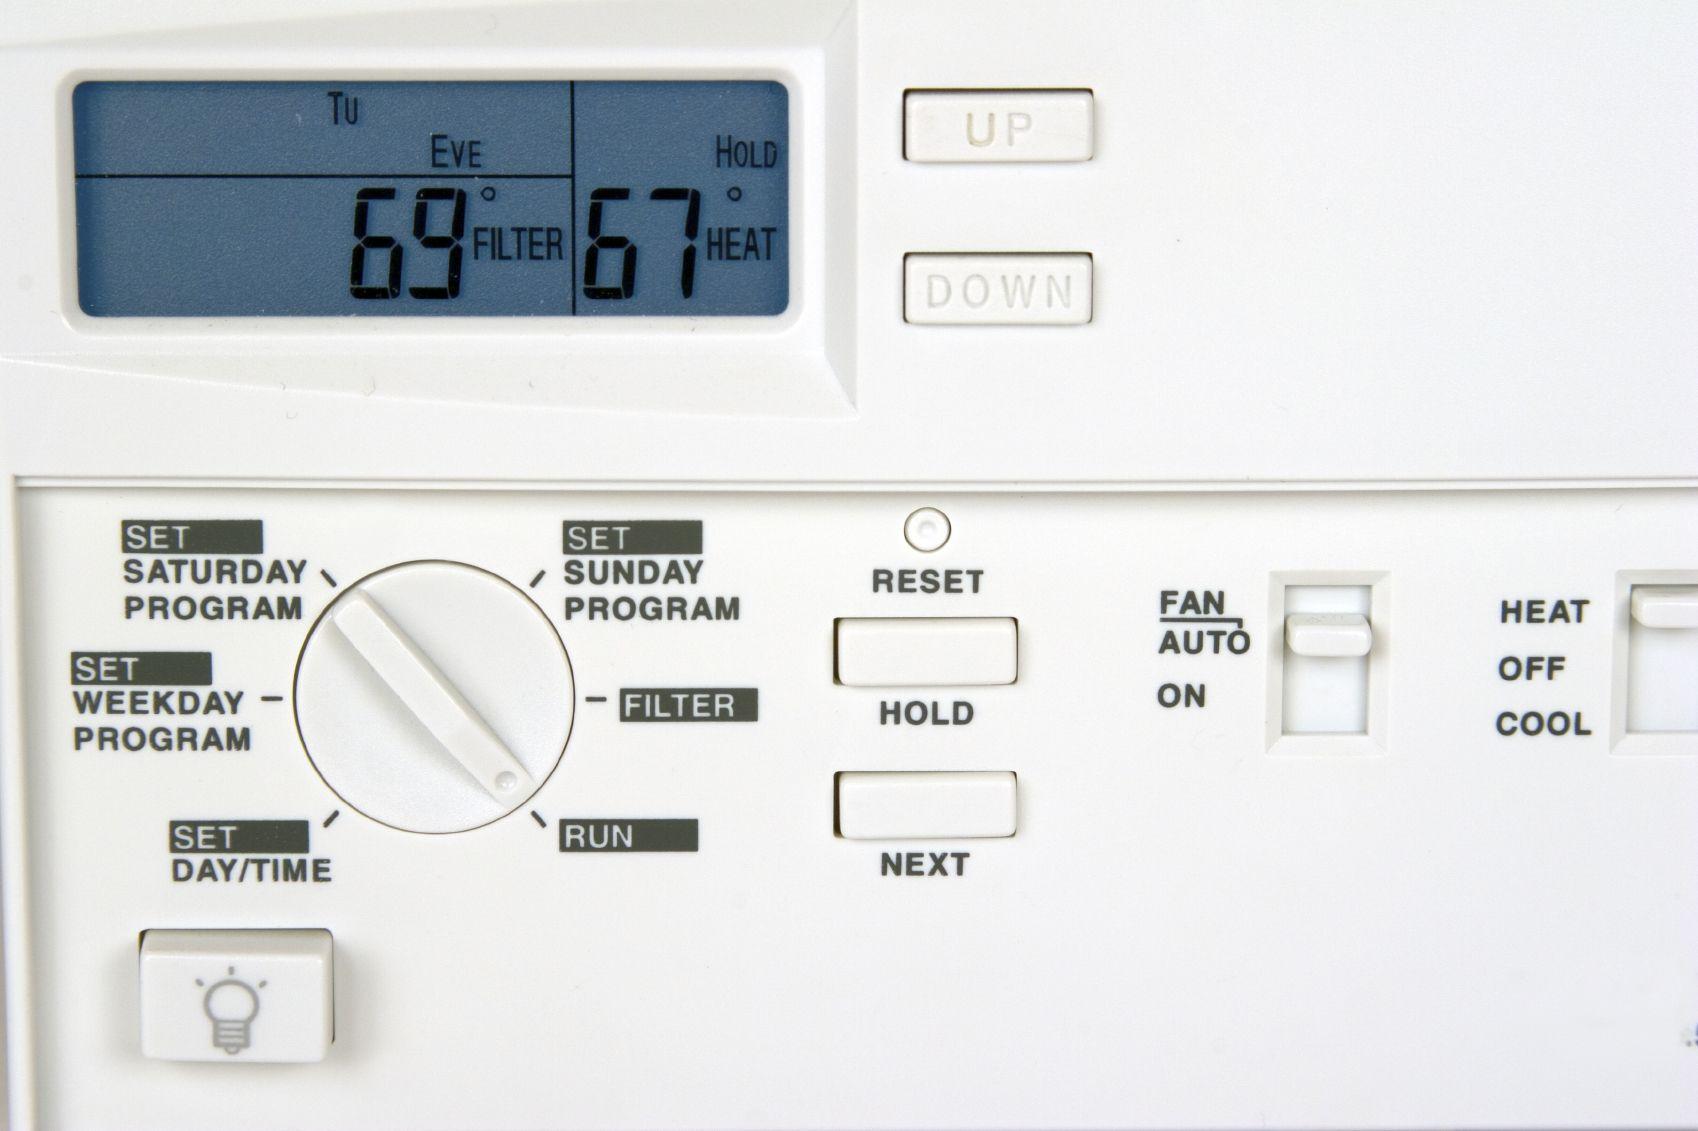 iStock_000000399100Medium Programmable thermostat, Home